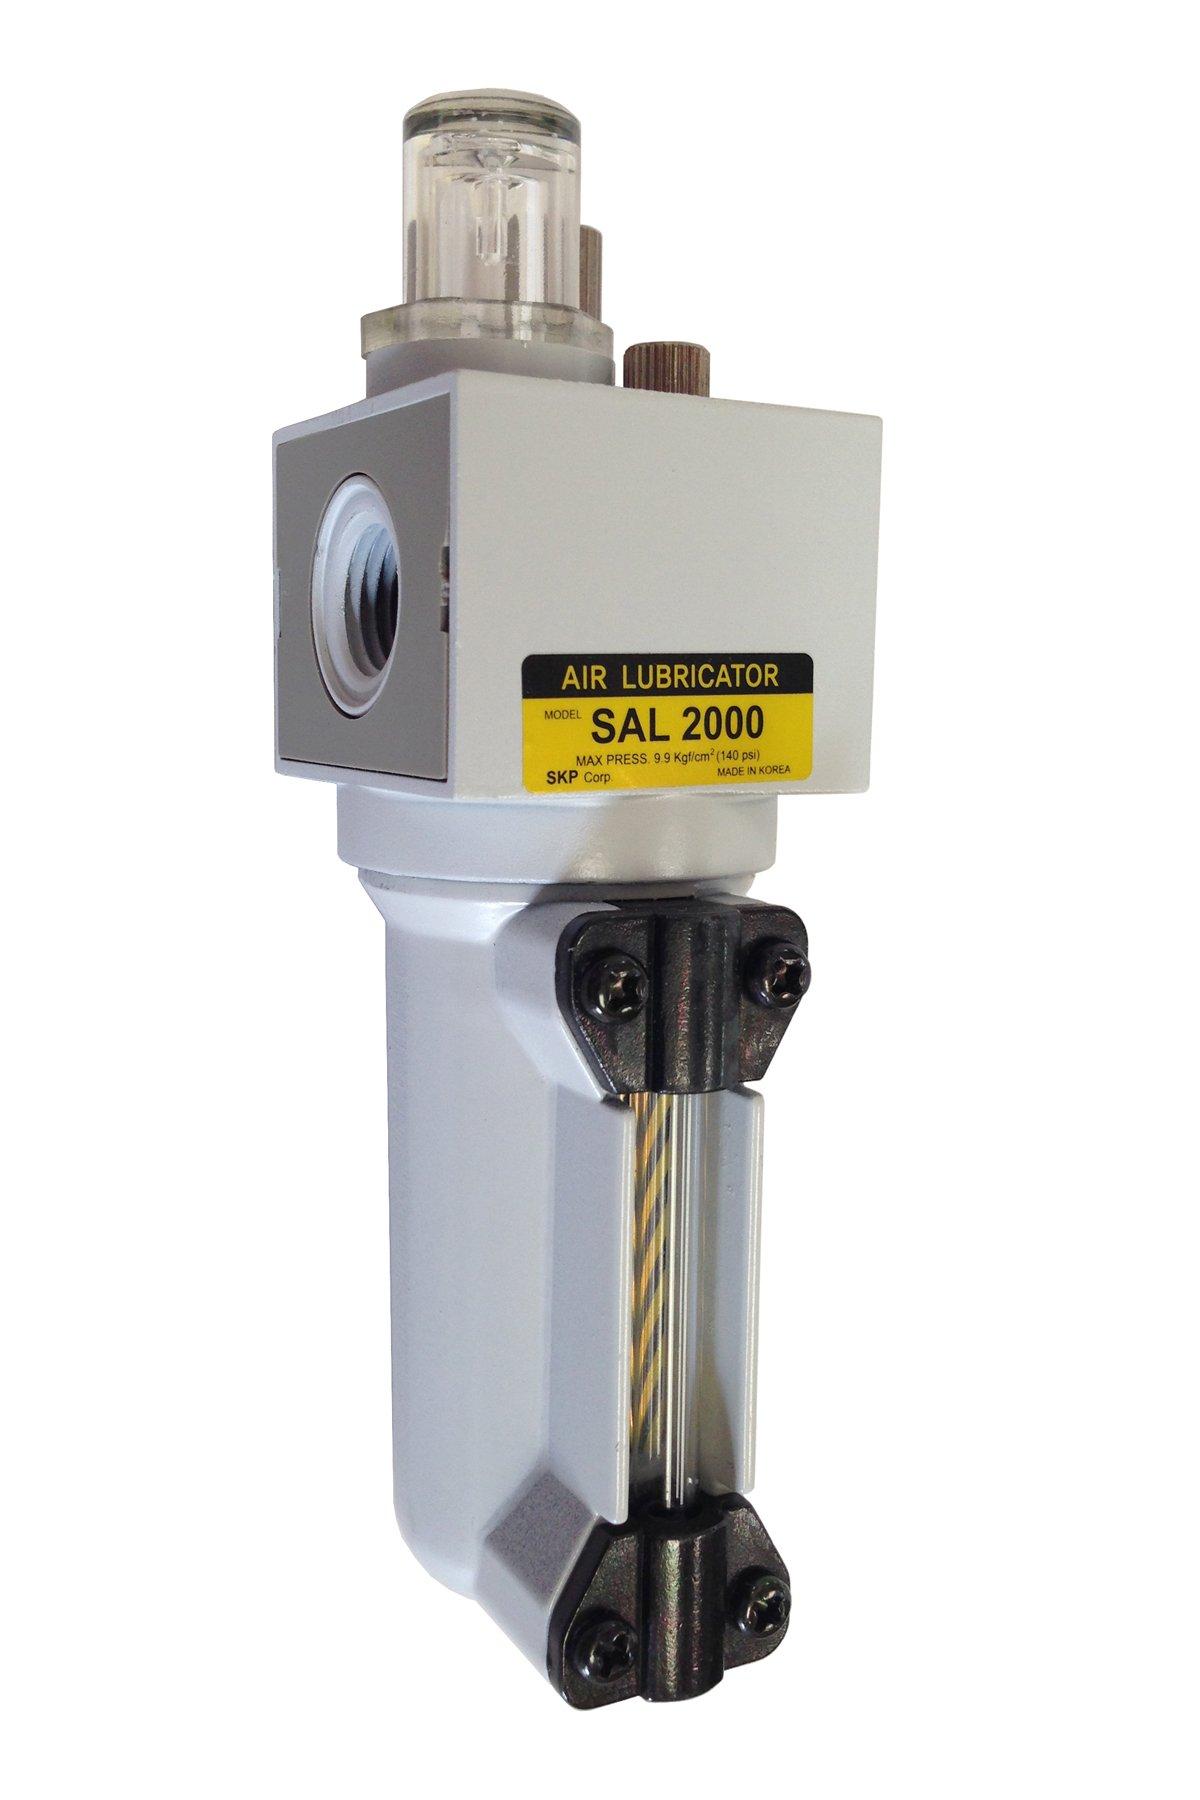 PneumaticPlus SAL2000M-N02B-MEP Miniature Compressed Air Lubricator 1/4'' NPT - Metal Bowl, Bracket